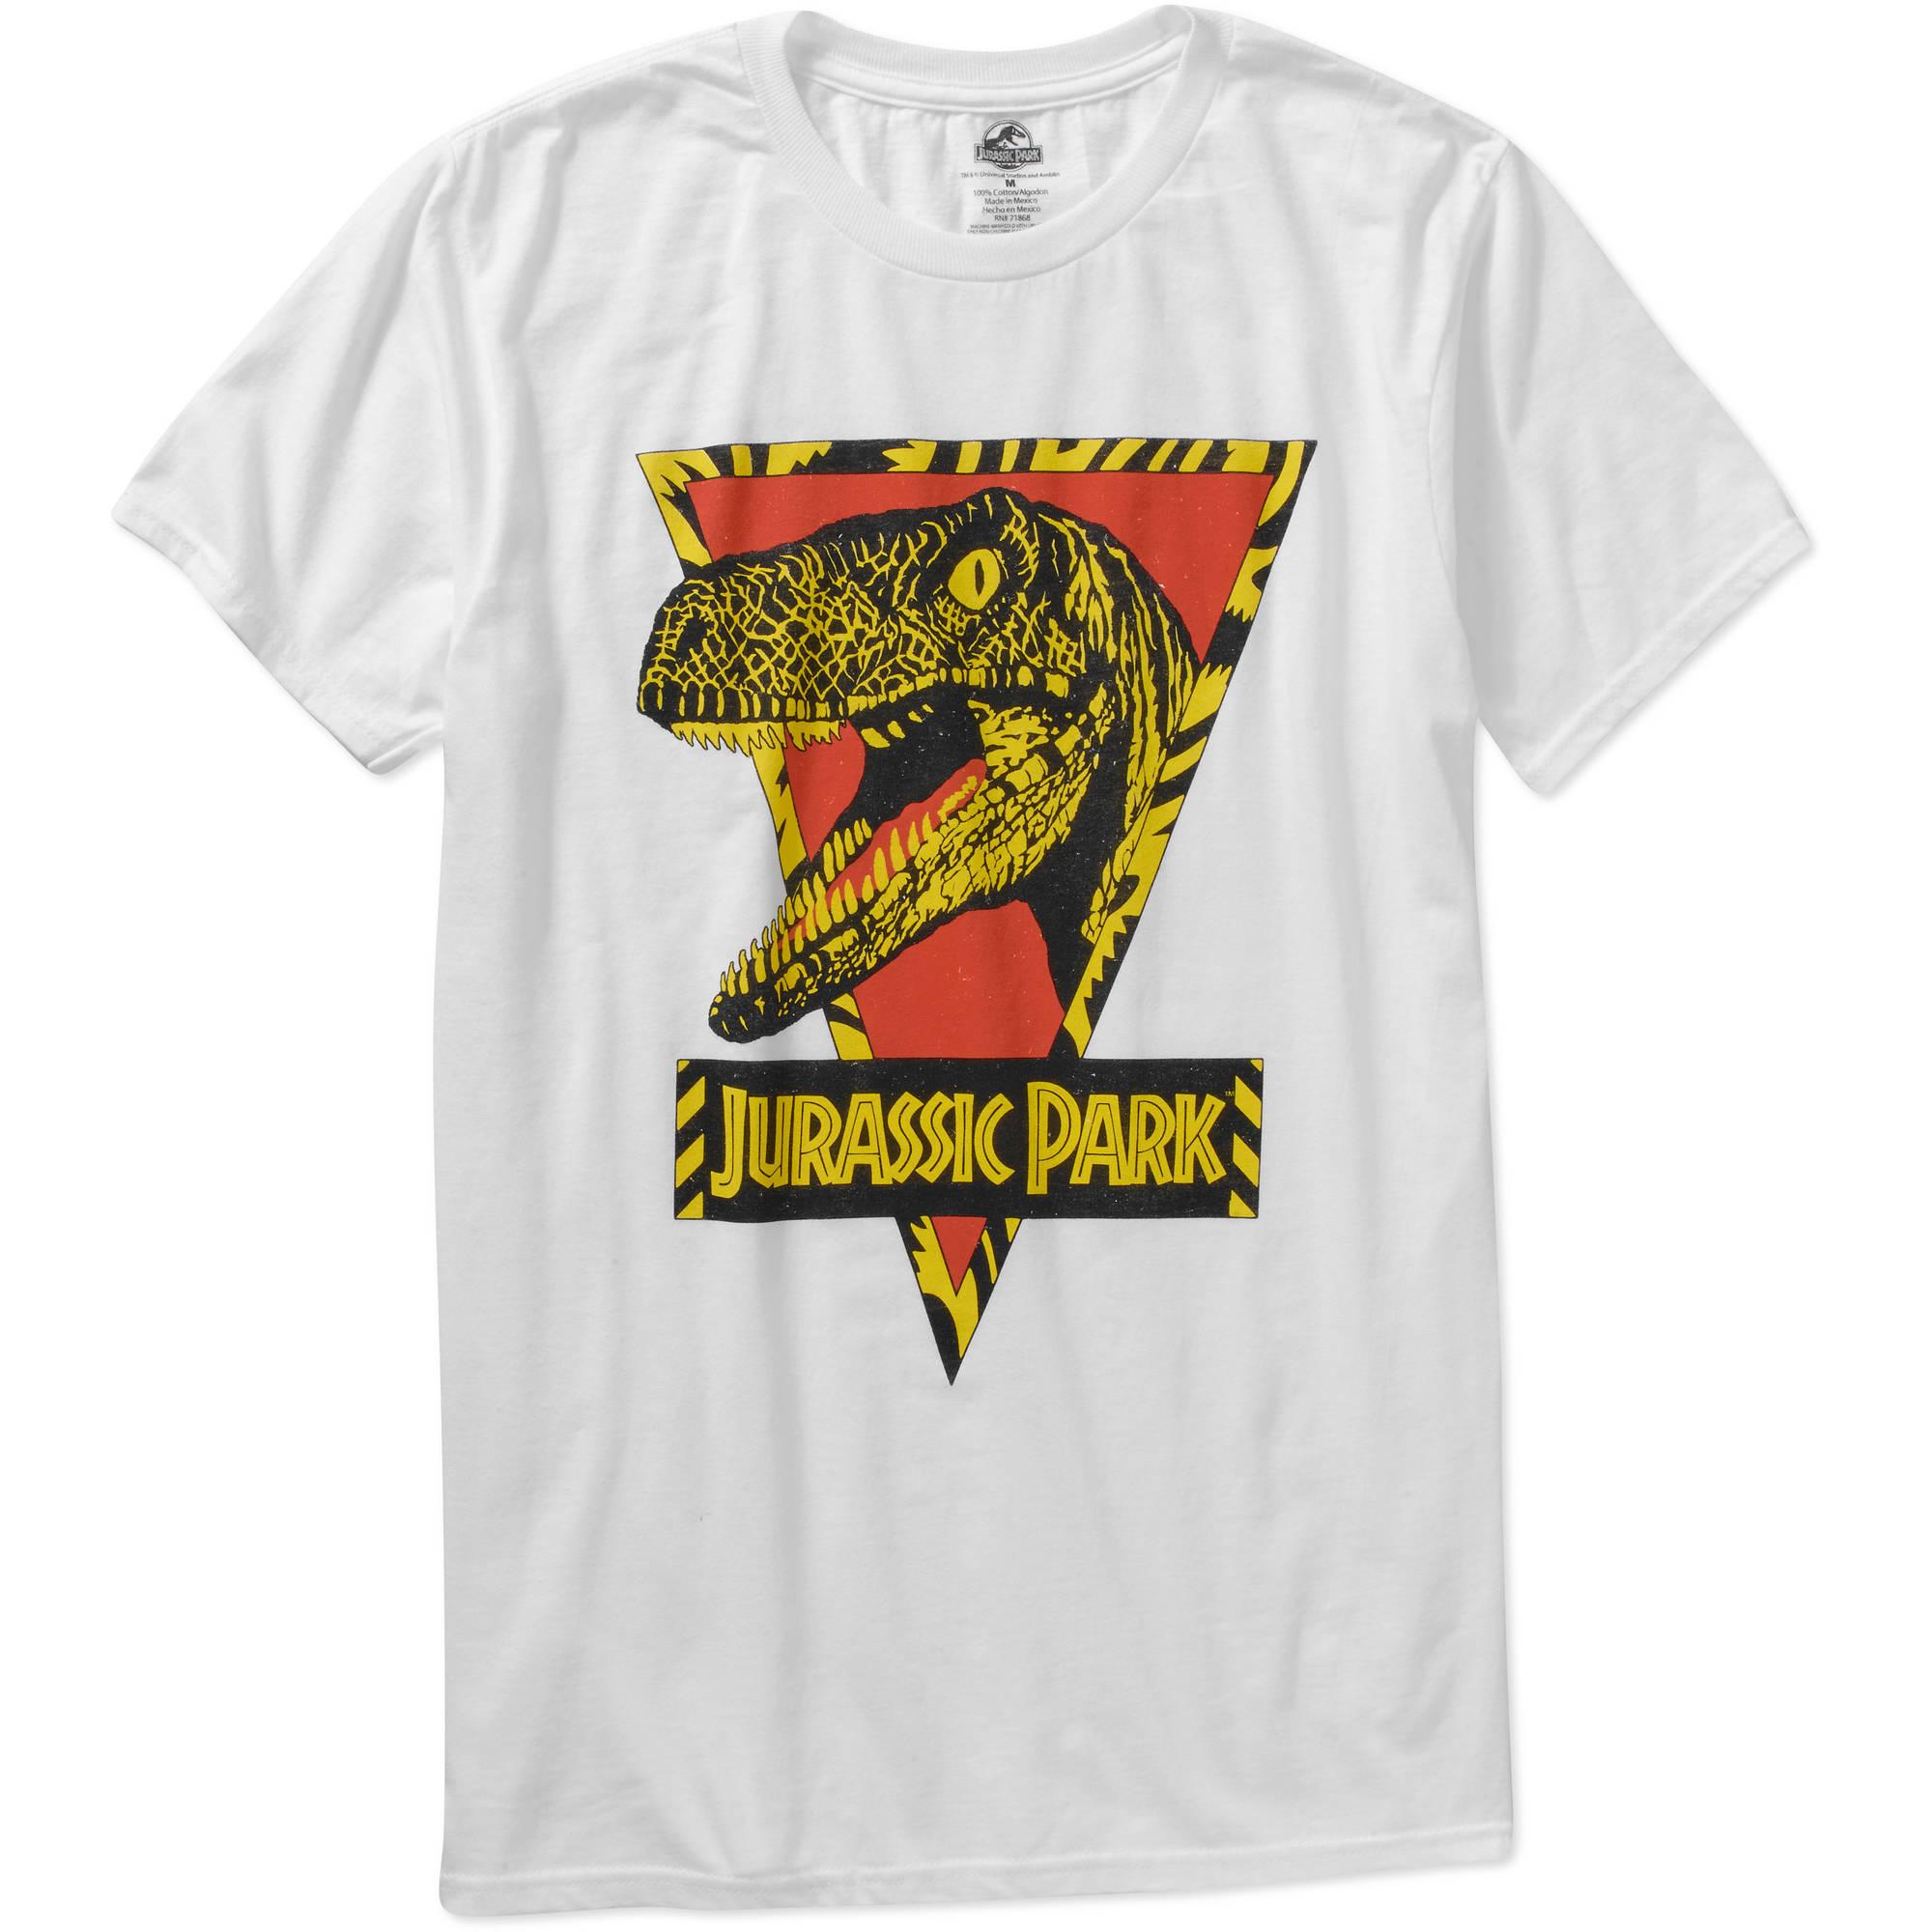 NBC Universal Jurassic Park Retro Logo Big Men's Graphic Short Sleeve T-Shirt